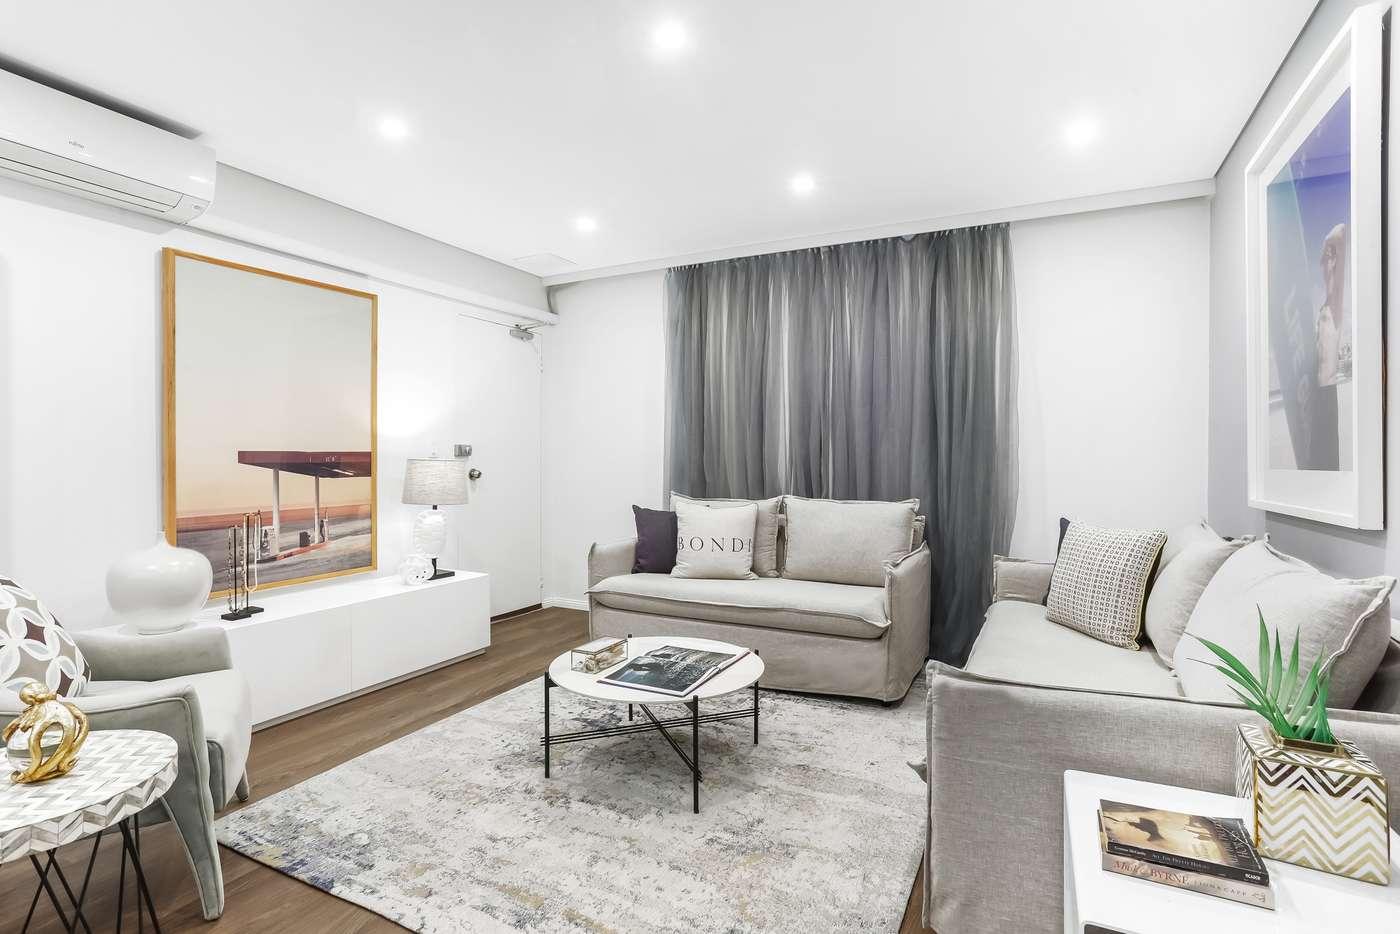 Main view of Homely apartment listing, 5/173-175 Glenayr Avenue, Bondi Beach NSW 2026